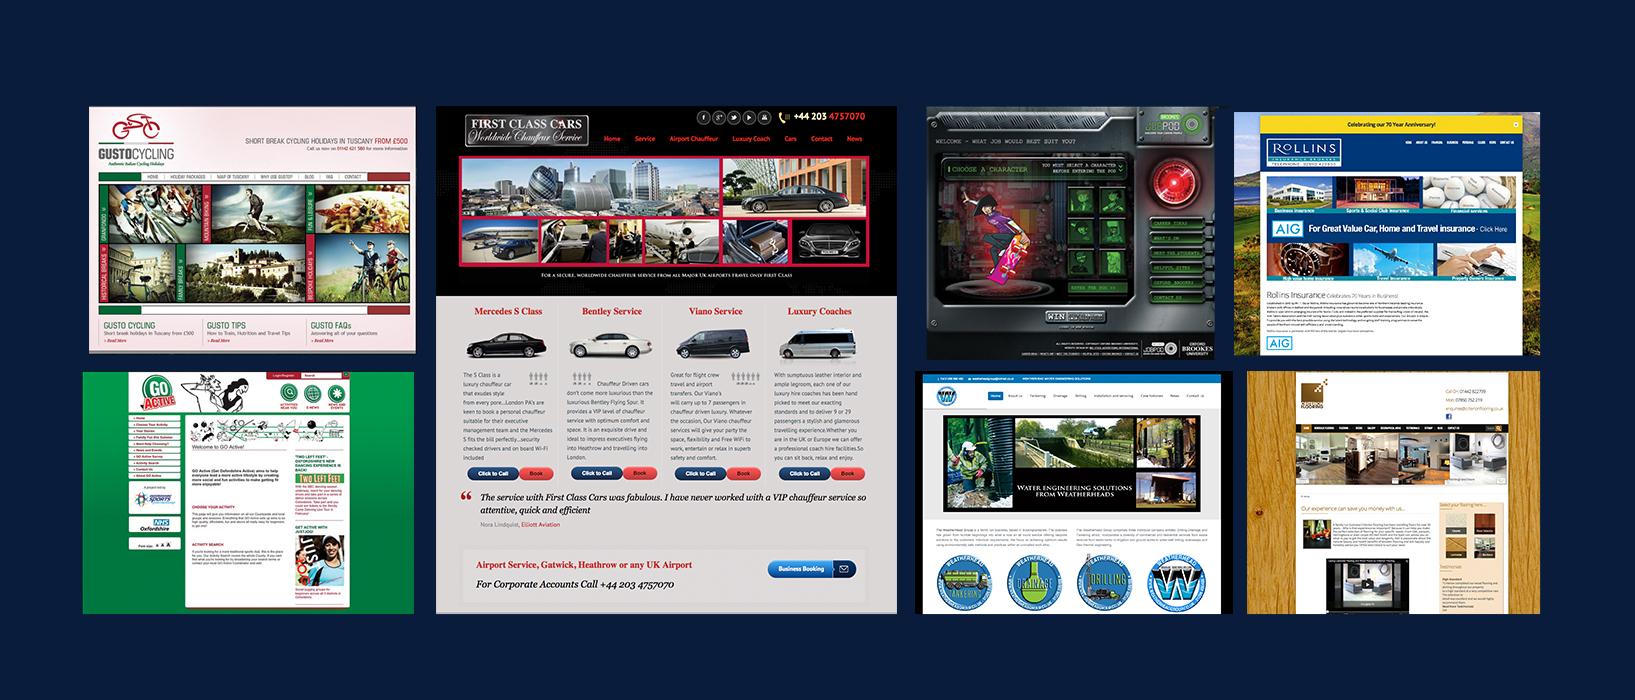 examples of Big Stick website design